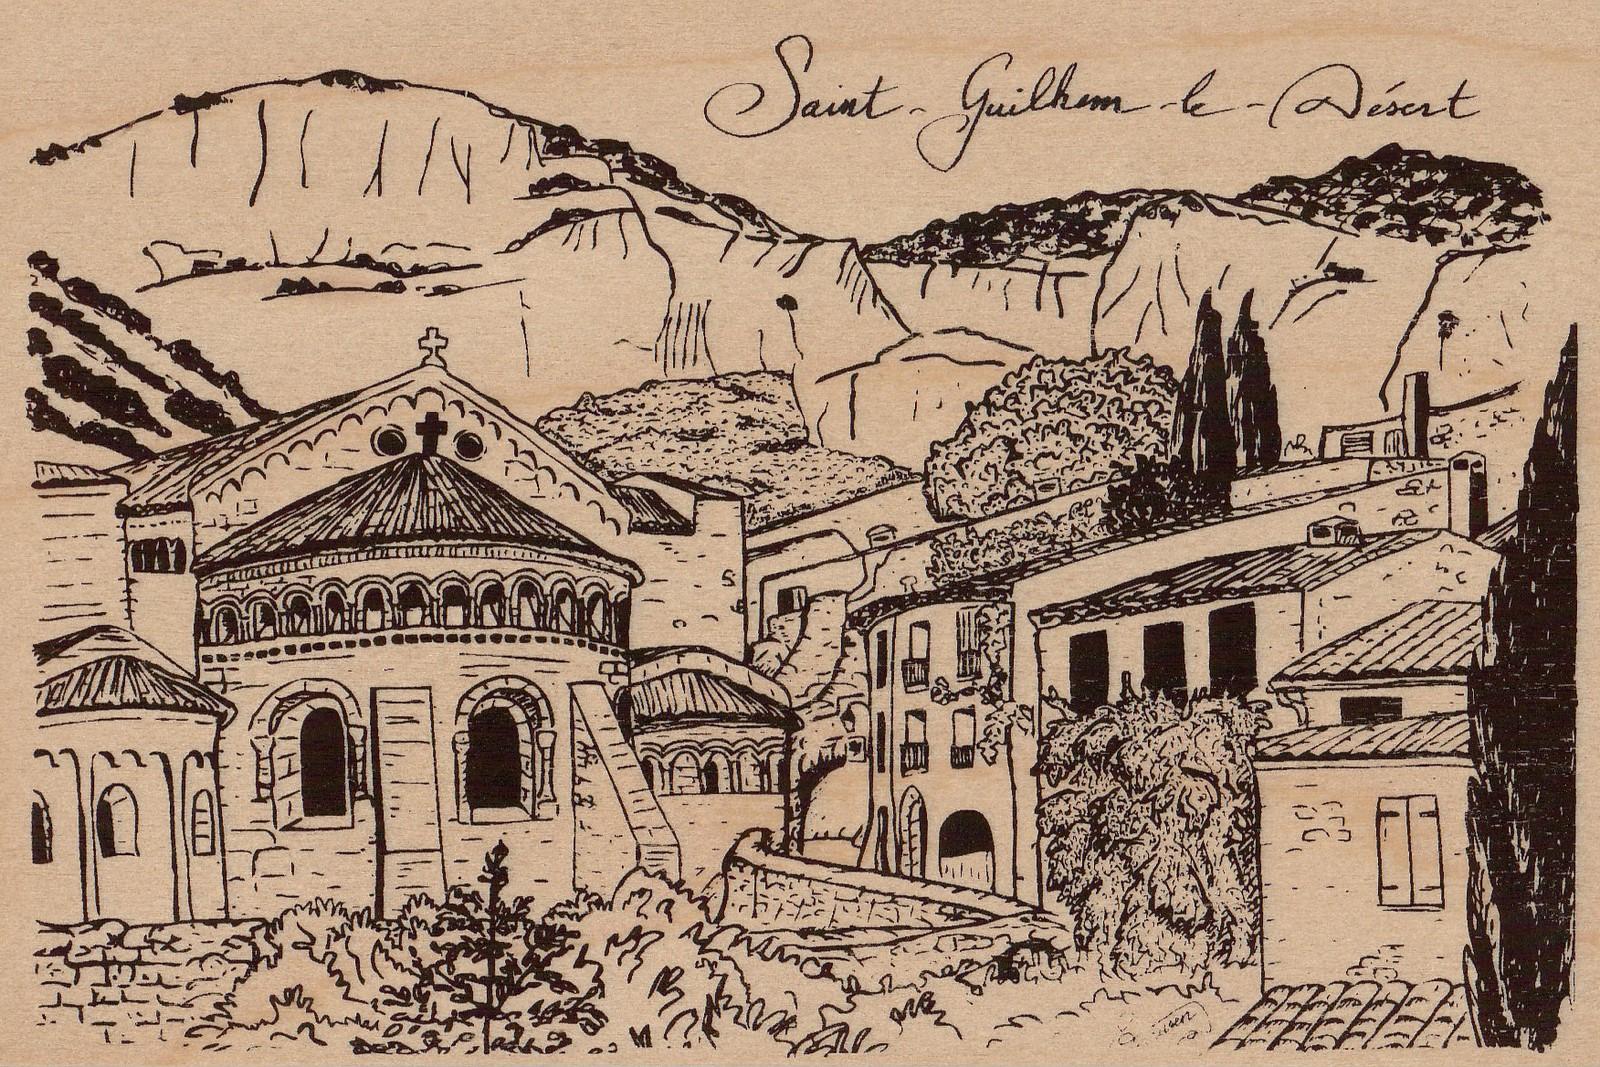 saint guilhem le desert-carte postale en bois-micropanorama